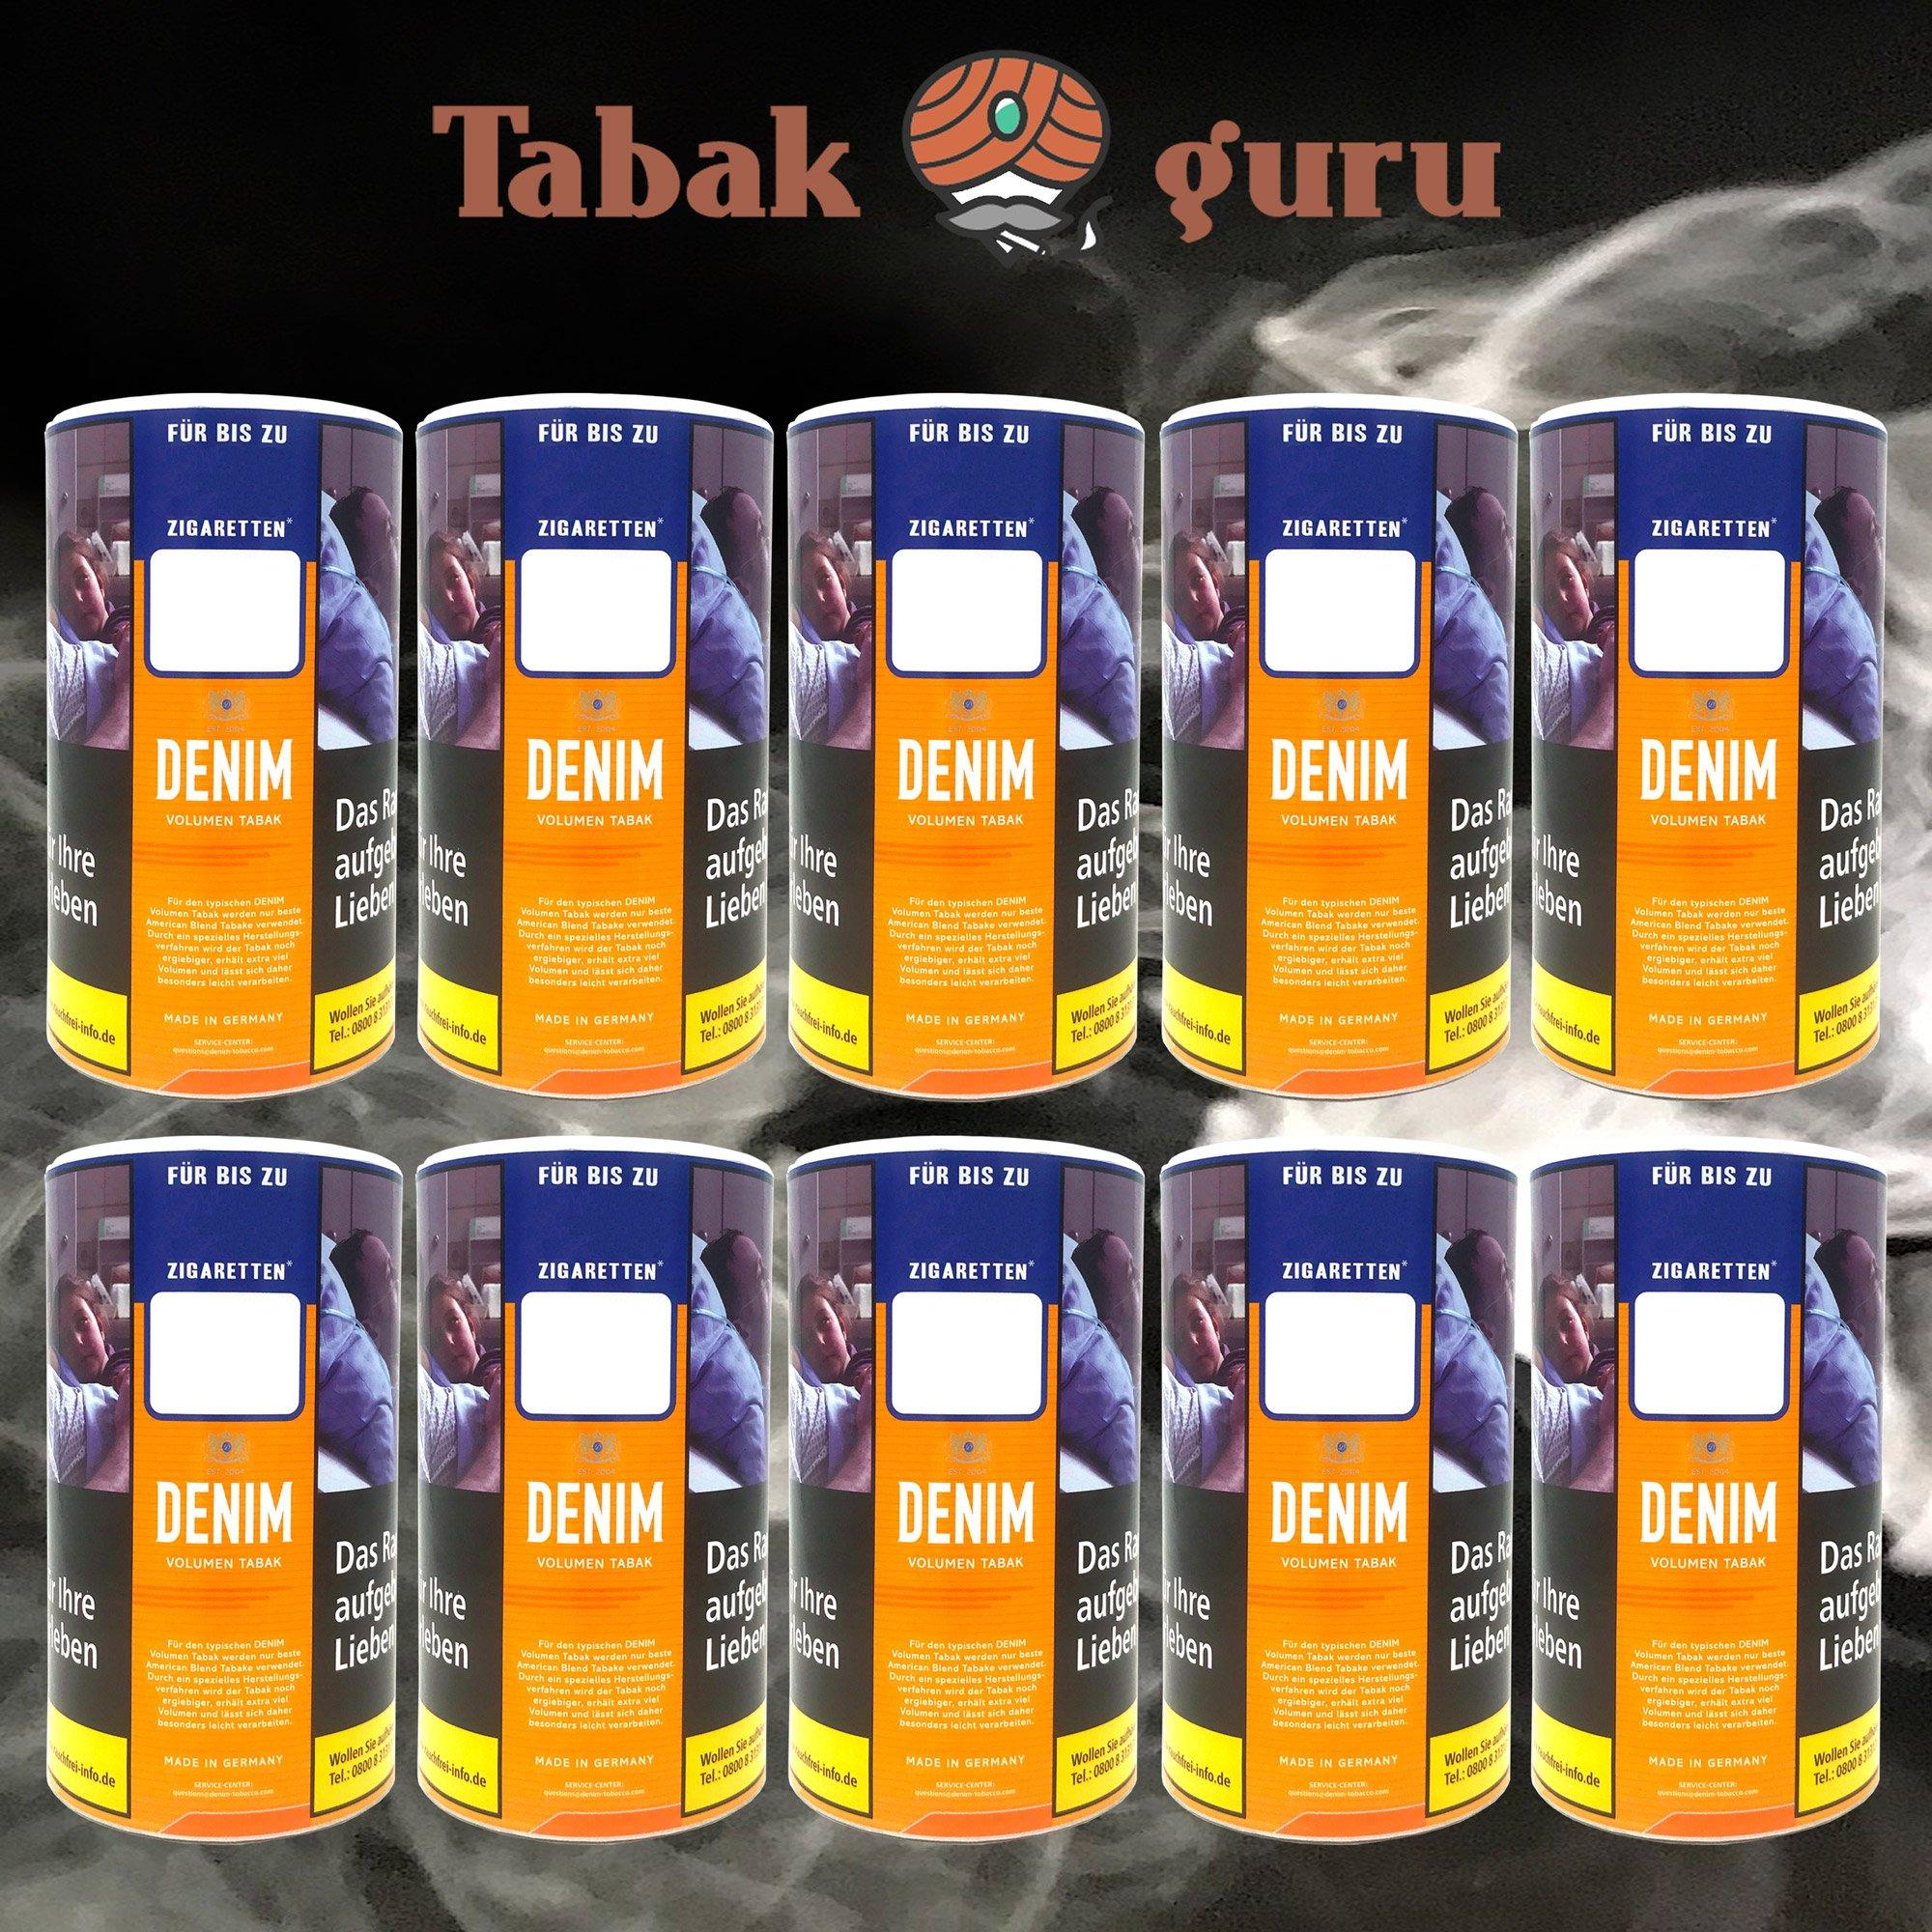 10 x Denim Volumentabak / Stopftabak 95g Dose